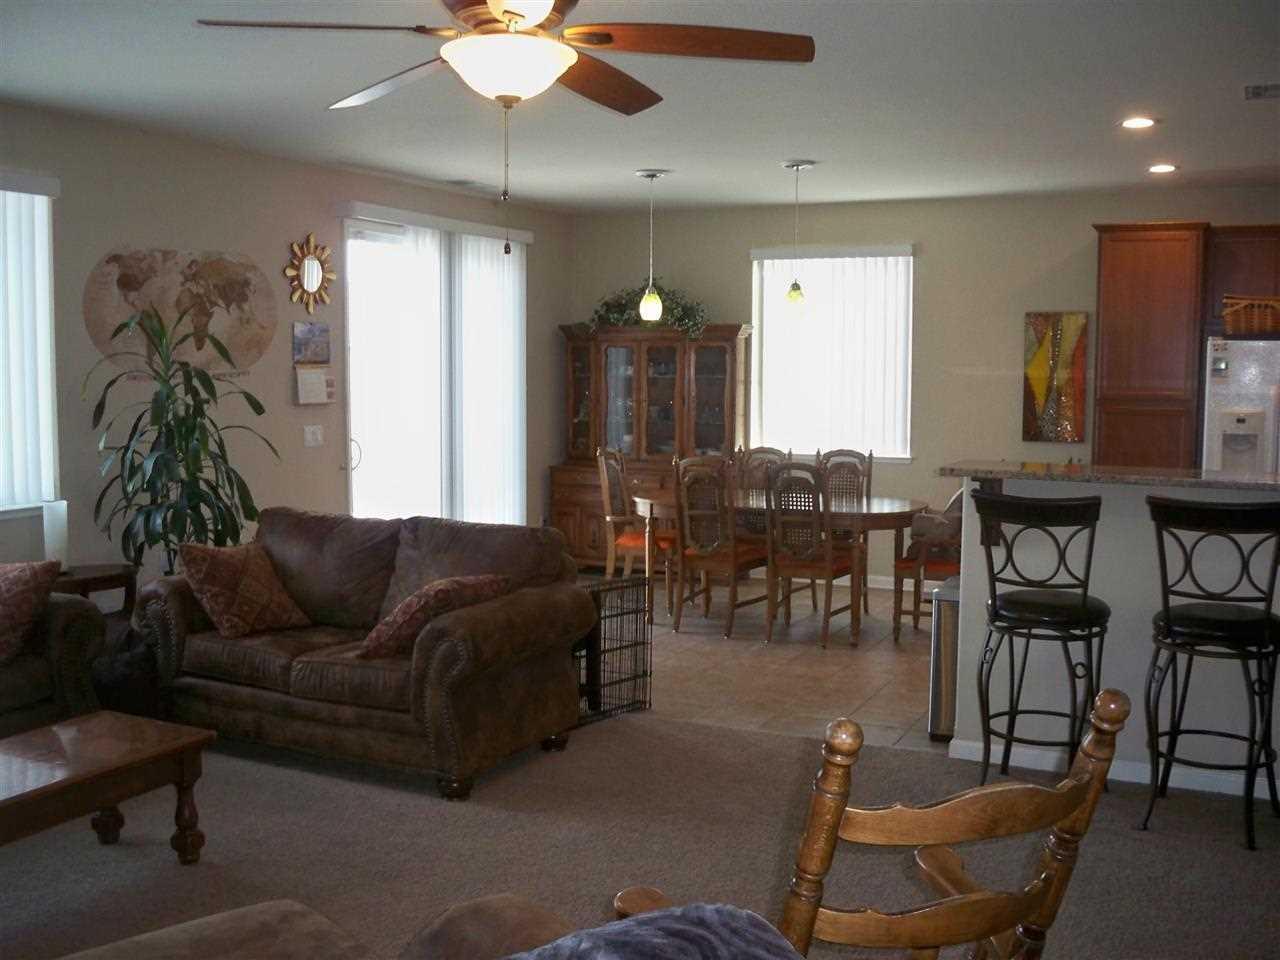 9150 Andraste Way Reno, NV 89506 | MLS 190001718 Photo 1